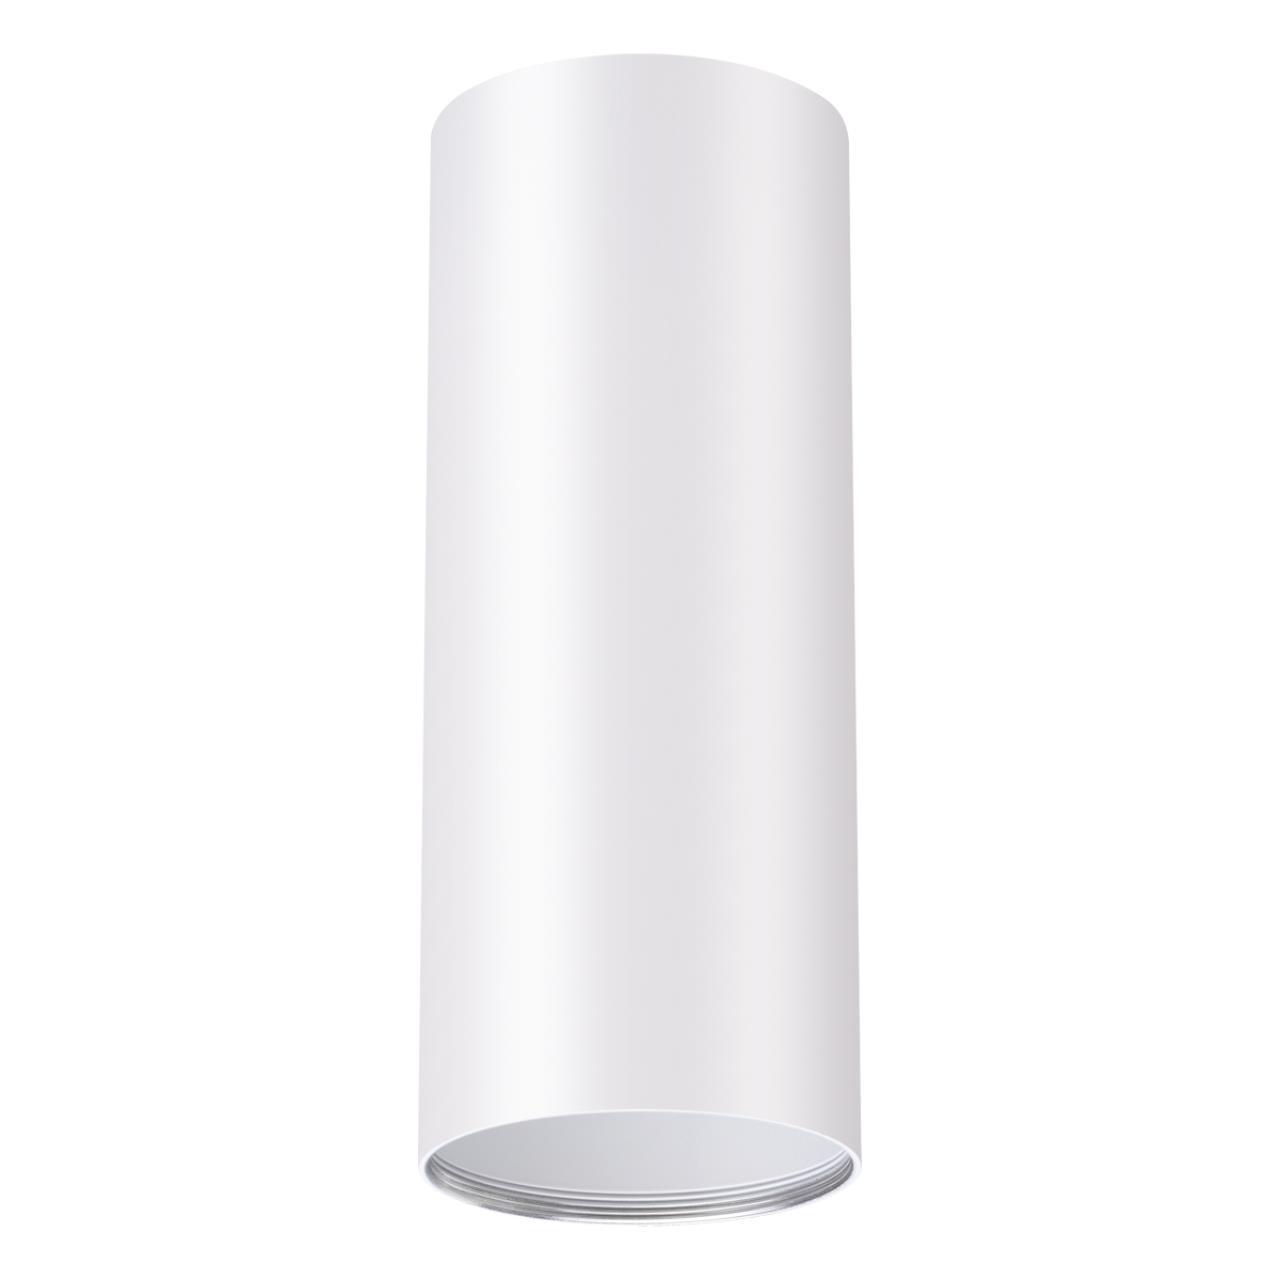 370532 KONST NT19 029 белый Накладной светильник IP20 GU10 220V UNITE